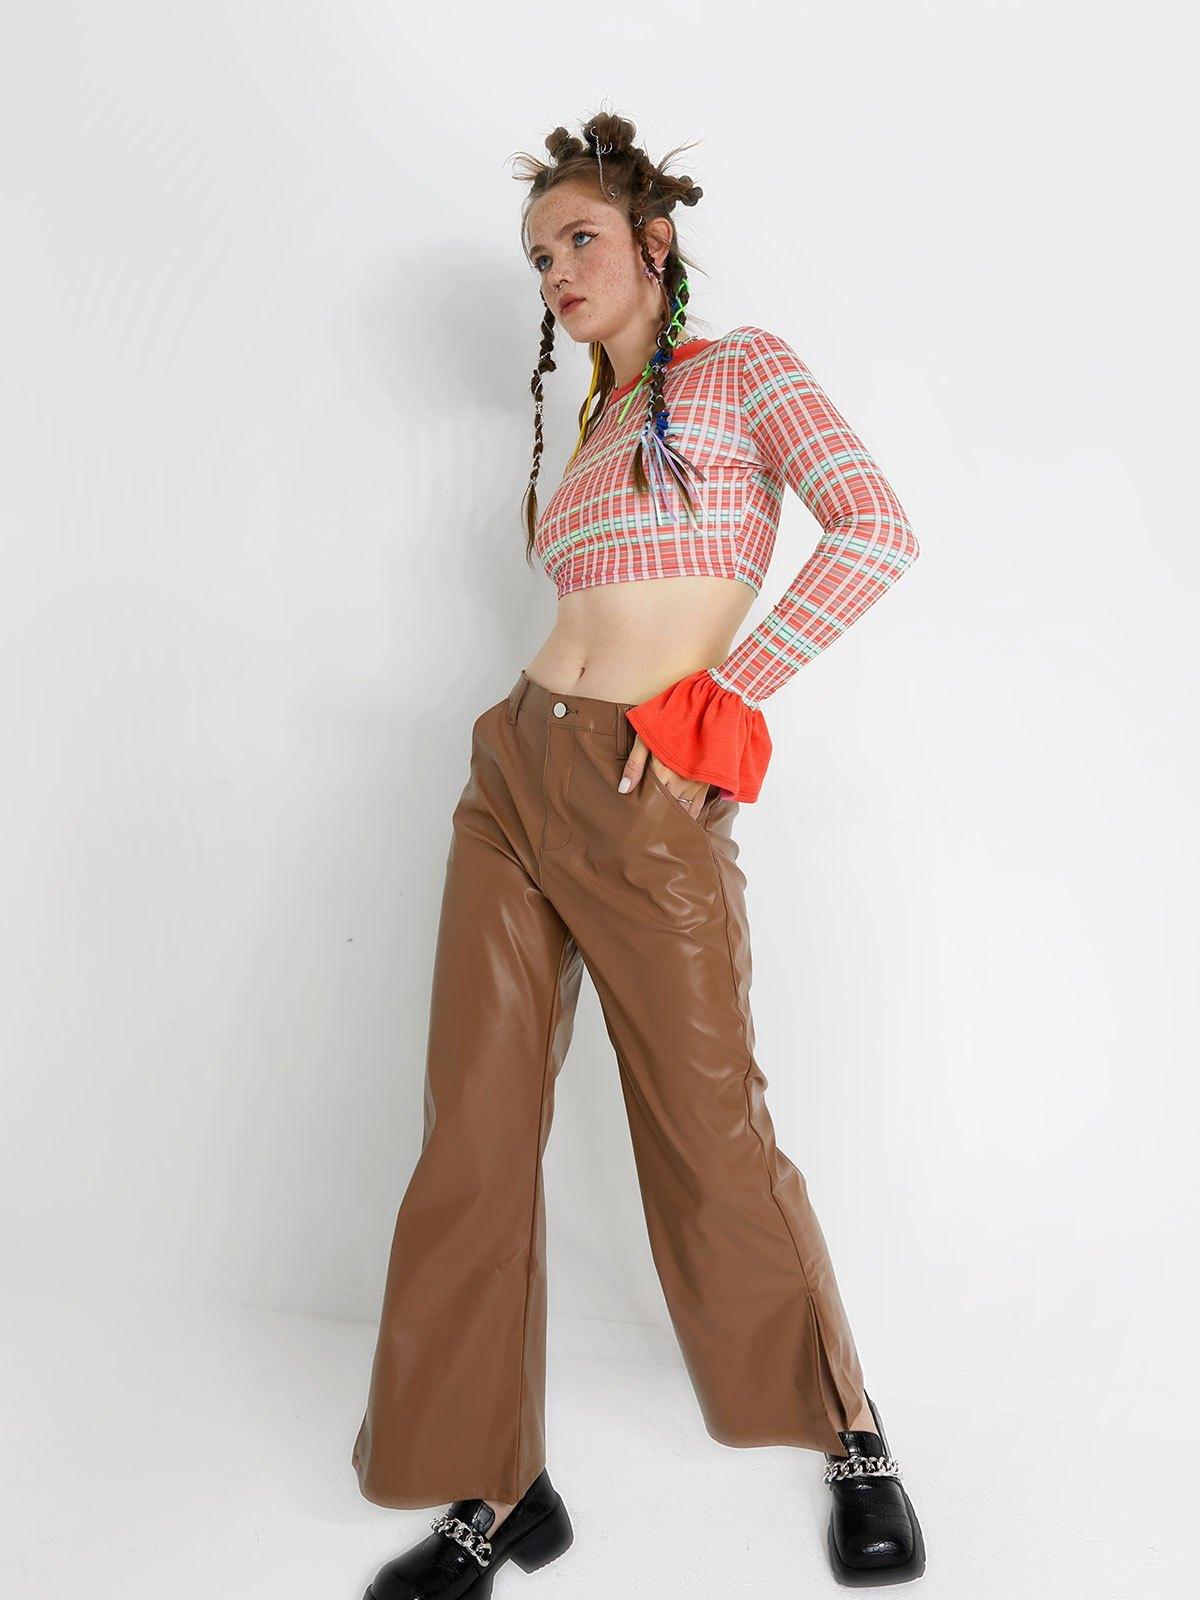 Pu Leather High Waist Bootcut Pants - Brown L